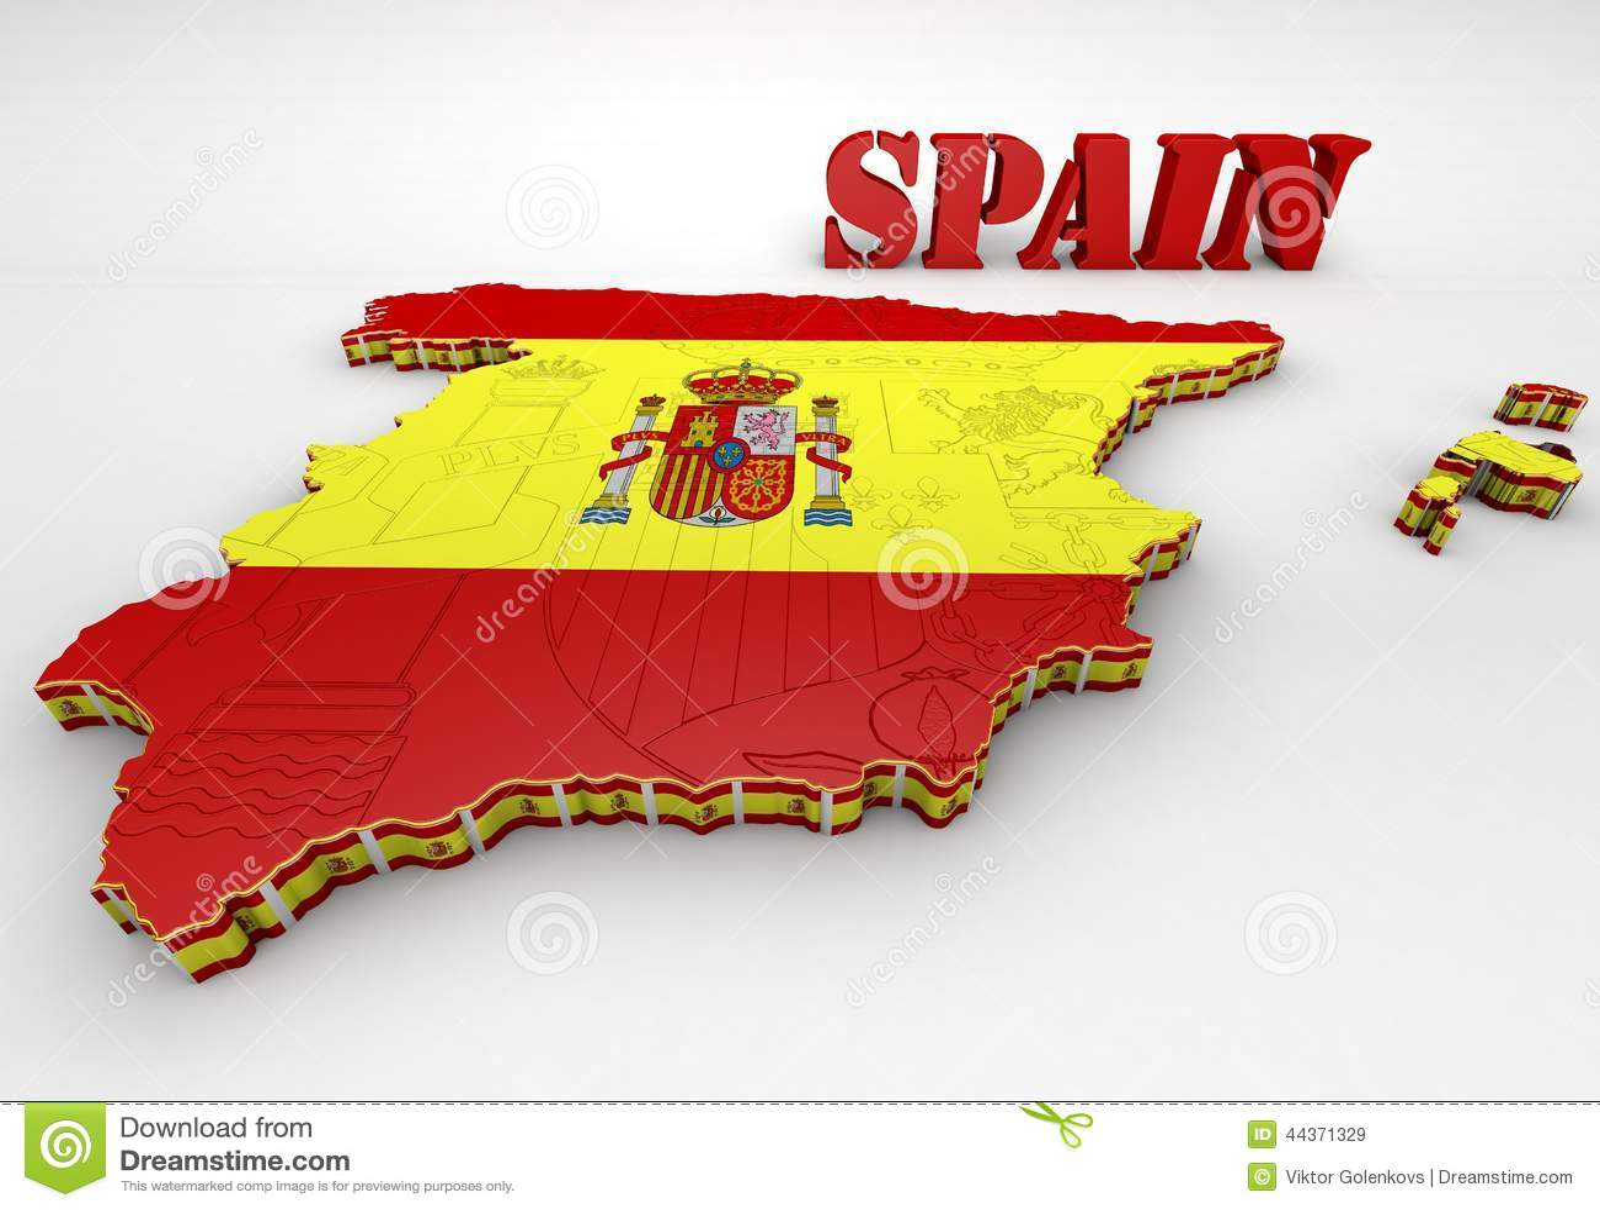 Programma della Spagna con la bandierina